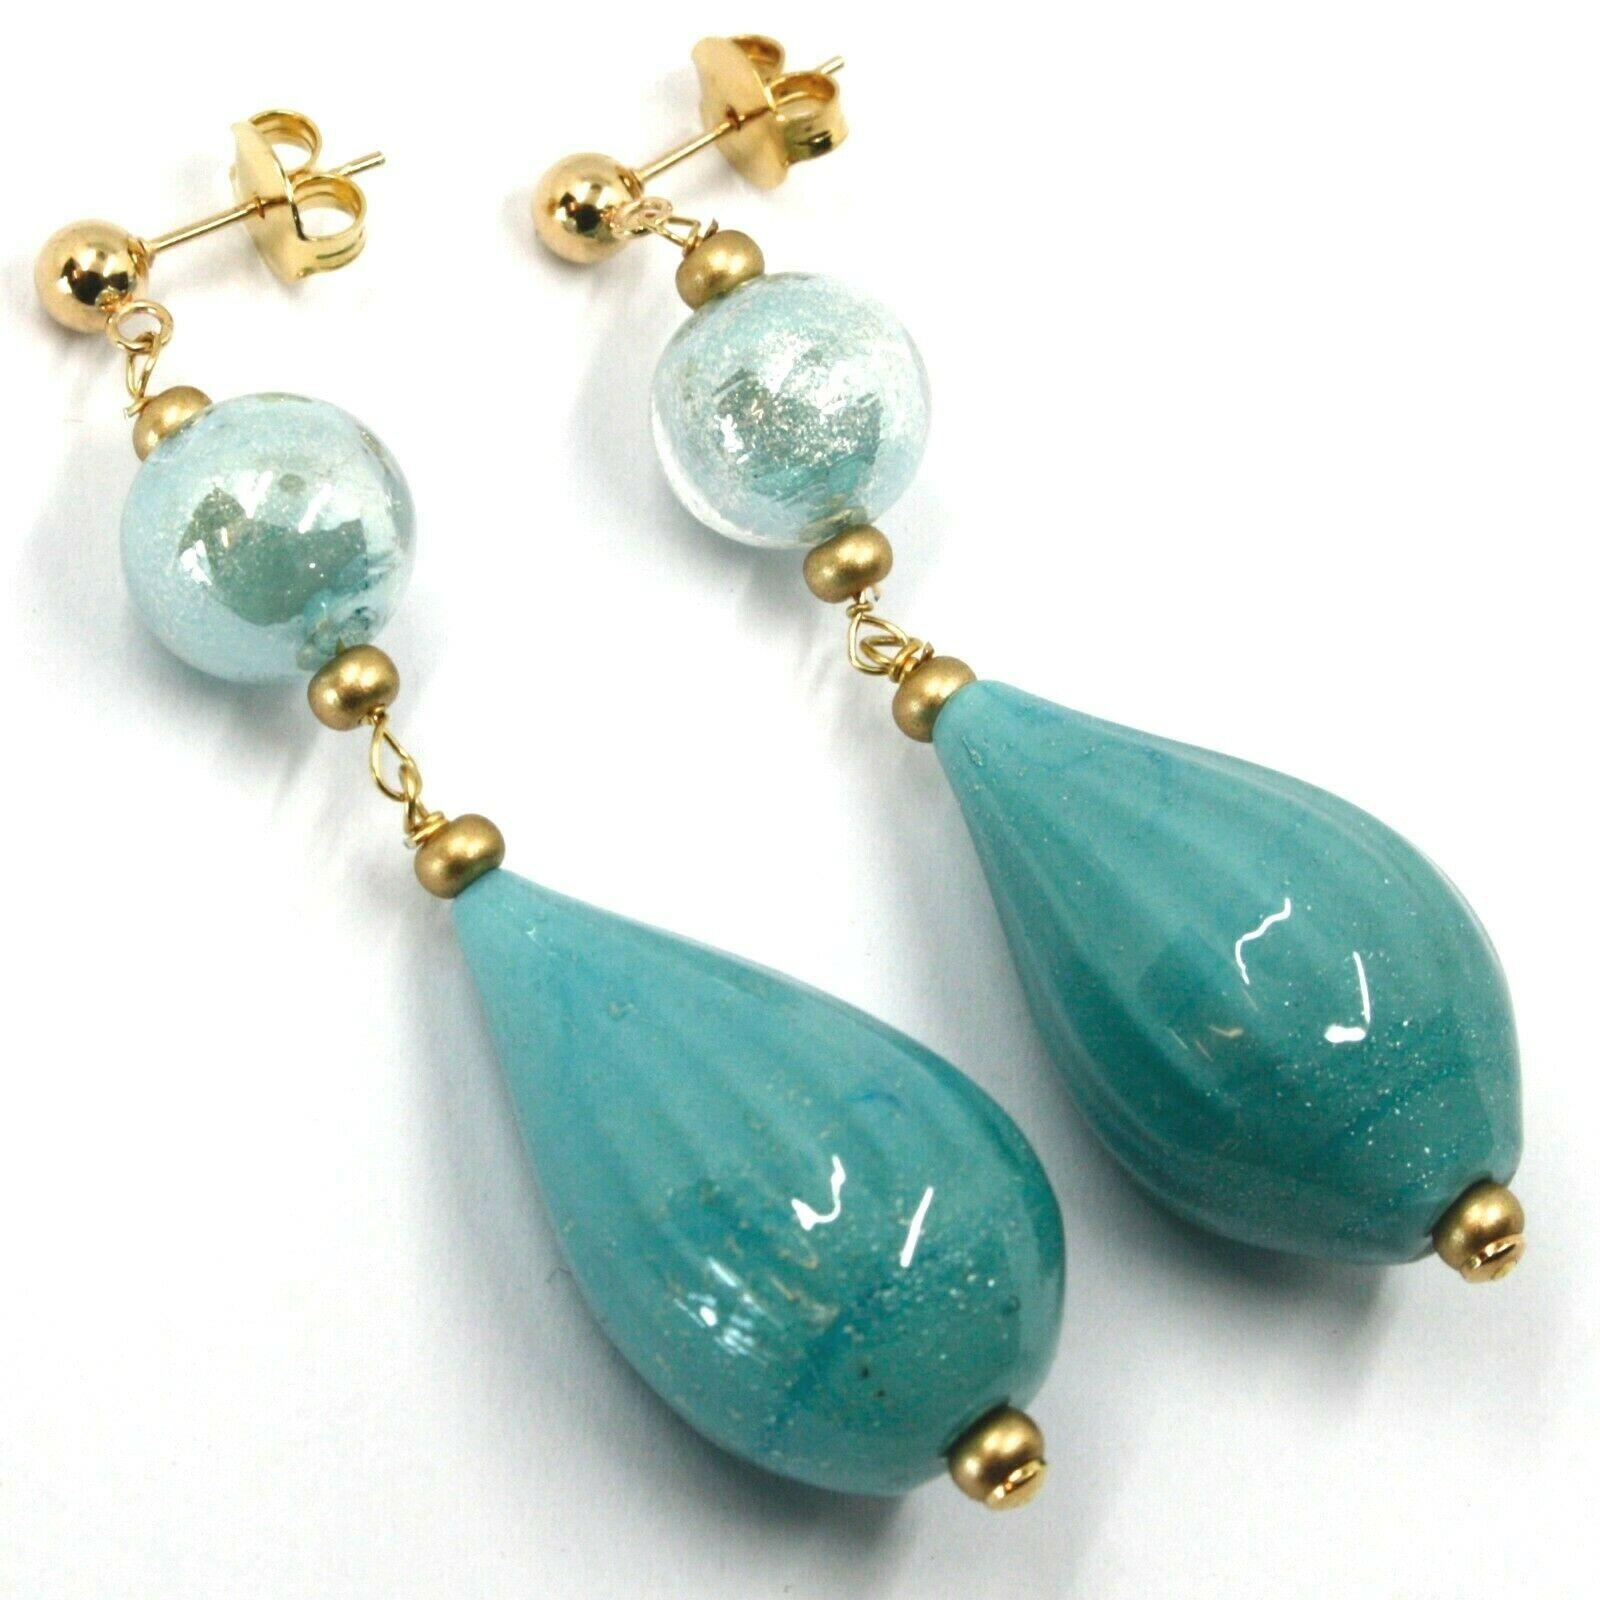 Earrings Antica Murrina Venezia, OR631A07, Hanging, Drop Glass Blue 3cm